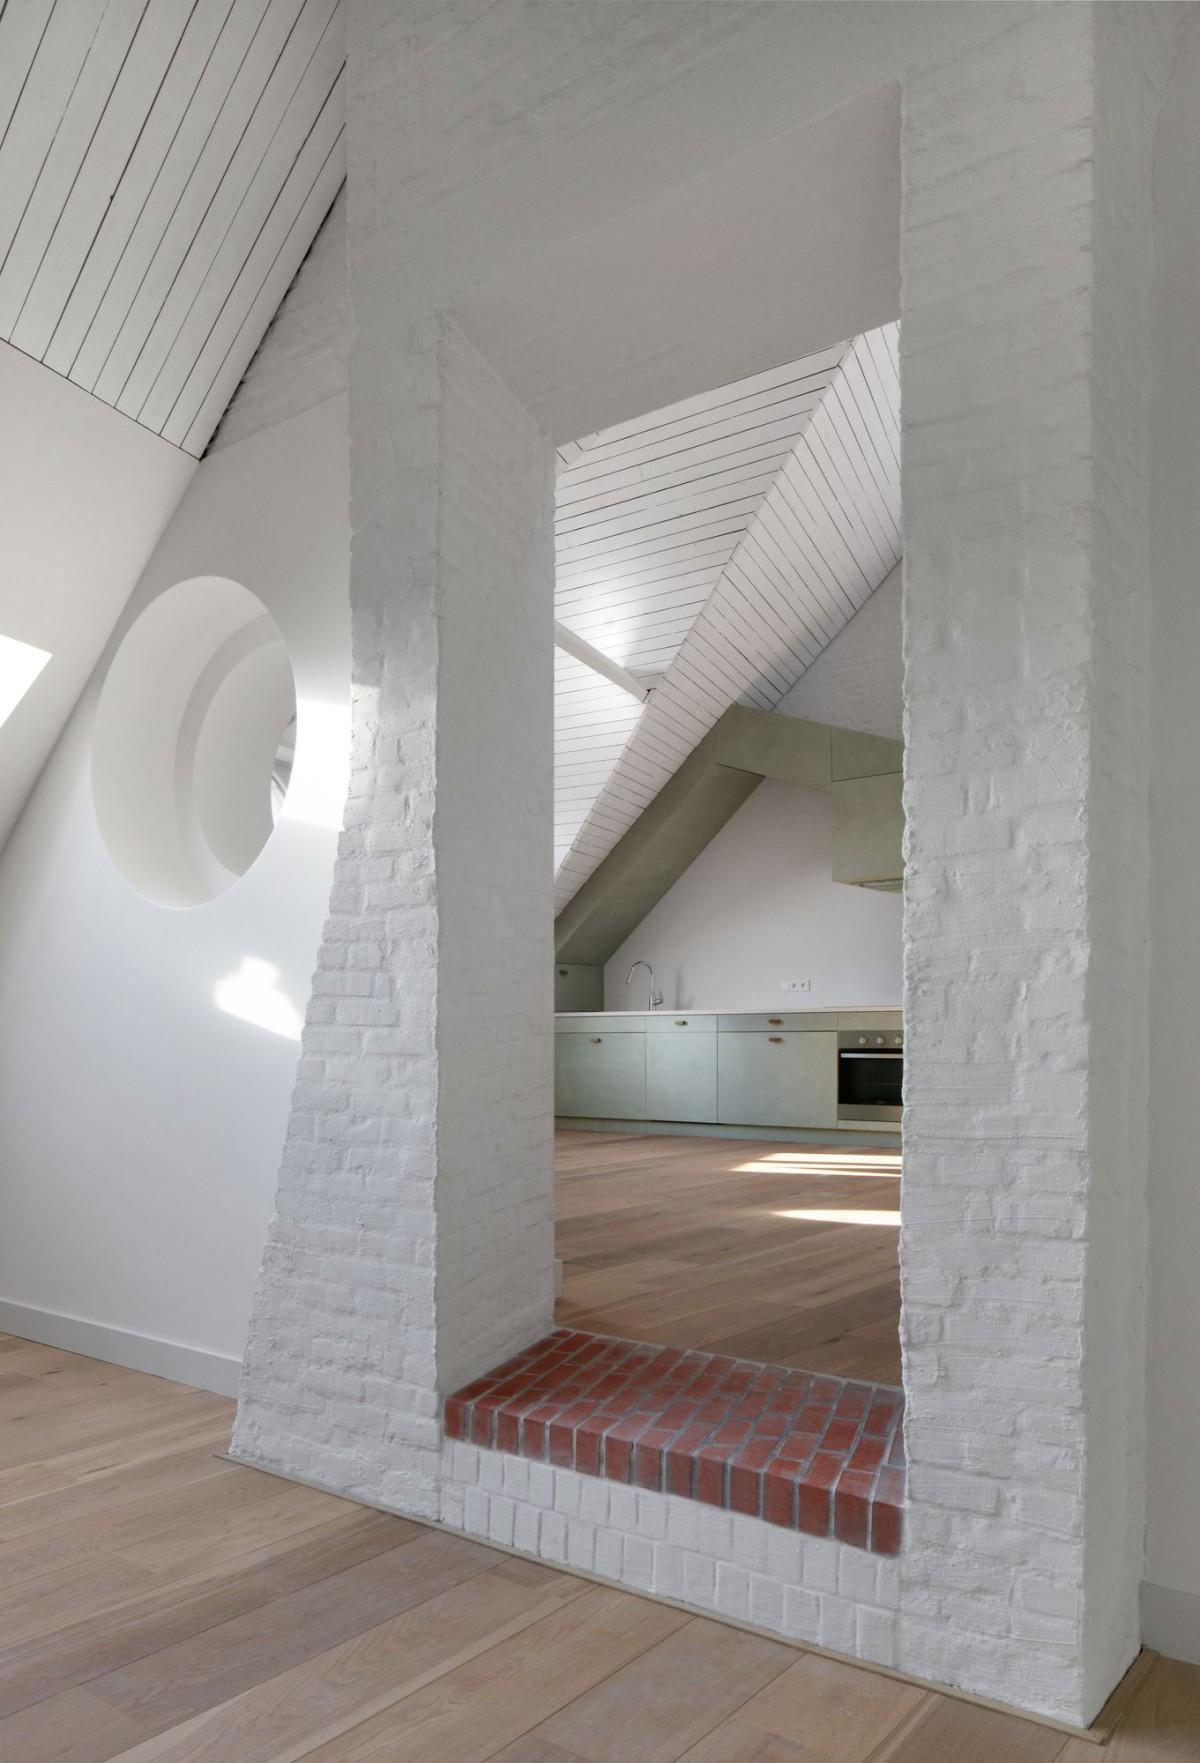 Bovenbouw Architectuur . Refurbishment of 3 historical buildings . Antwerp (27)